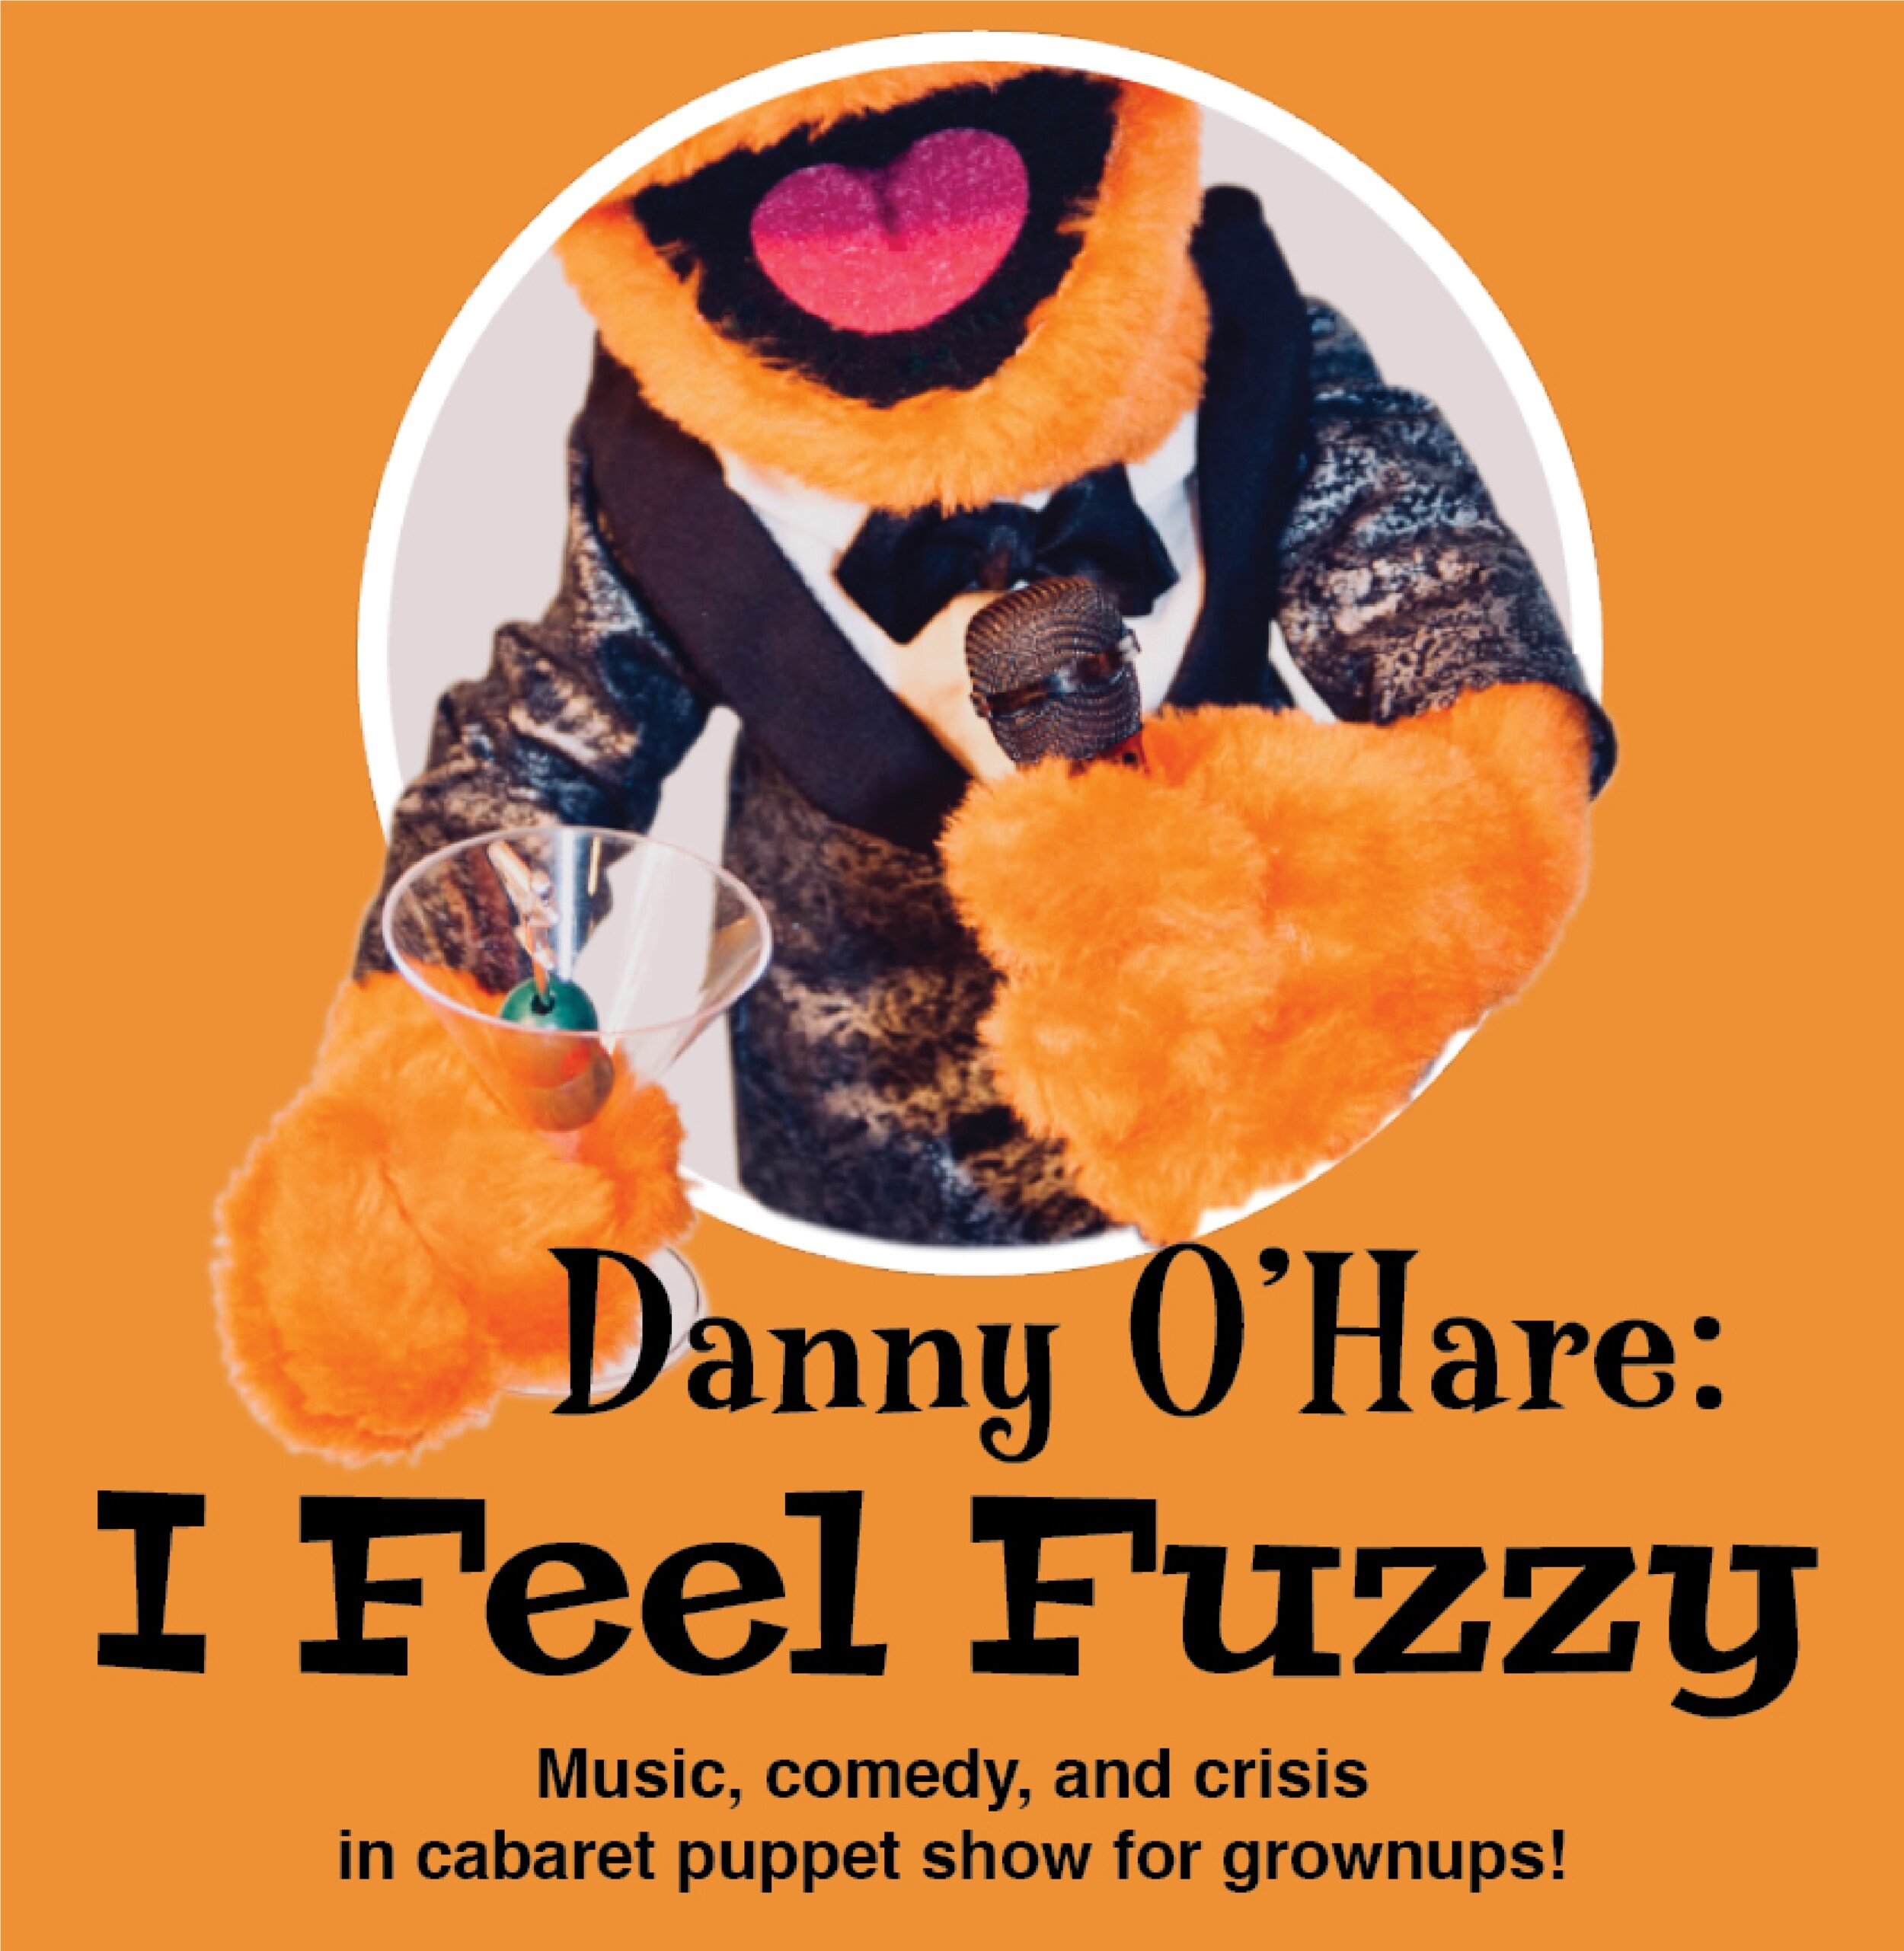 Danny+OHare+I+Feel+Fuzzy+A3+poster+online+version.jpg